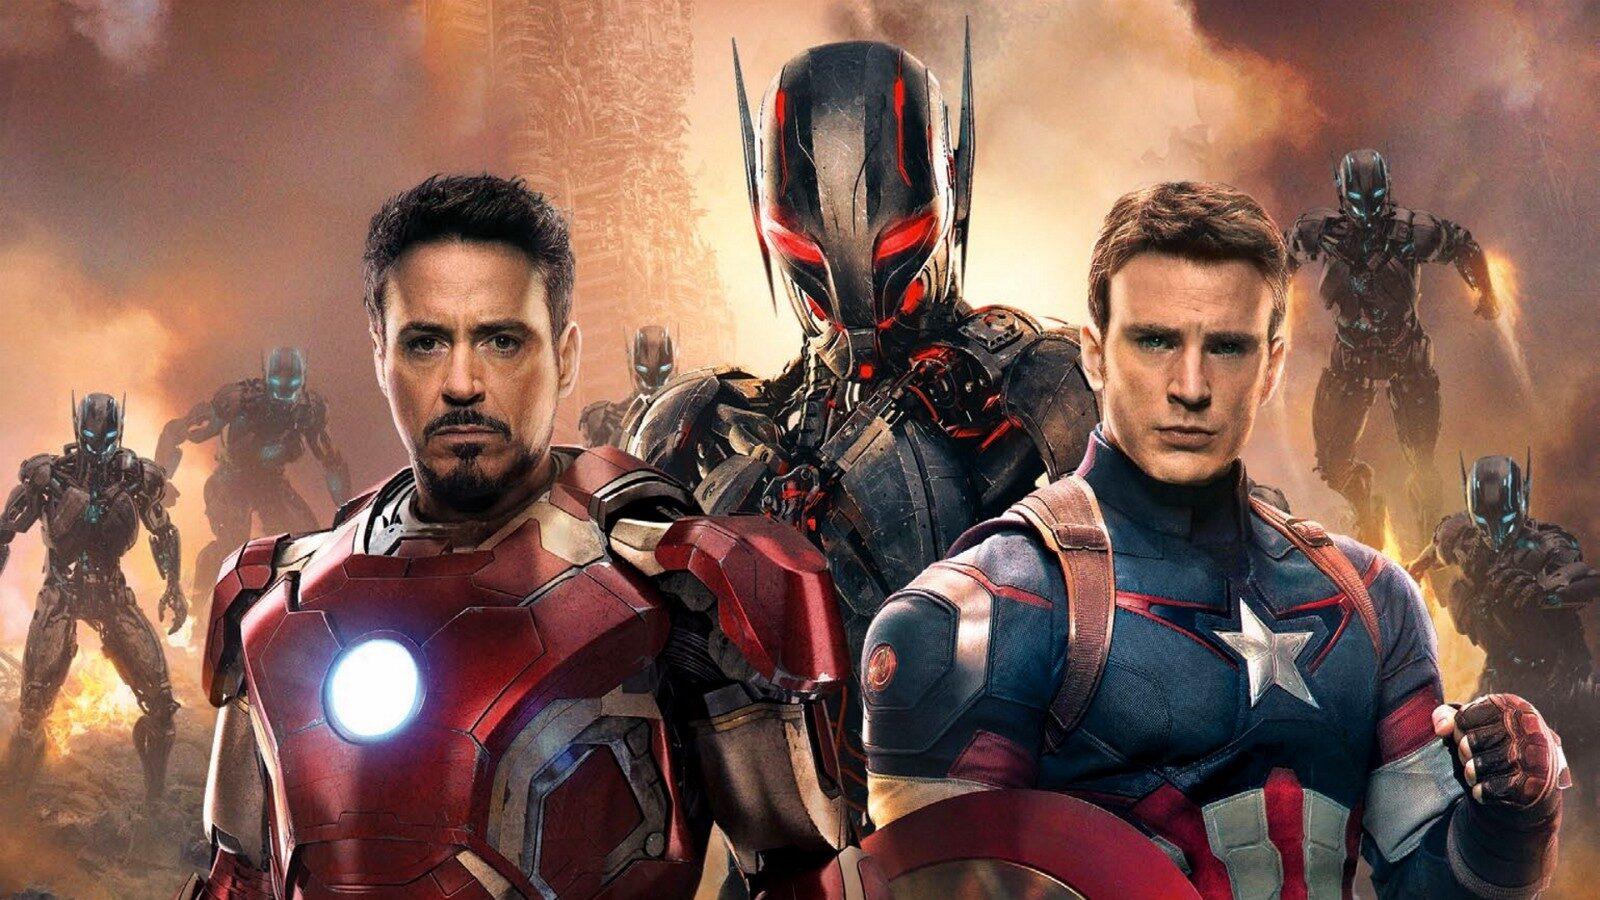 OXMOX Film-Tipp: Avengers: Age of Ultron [3D]